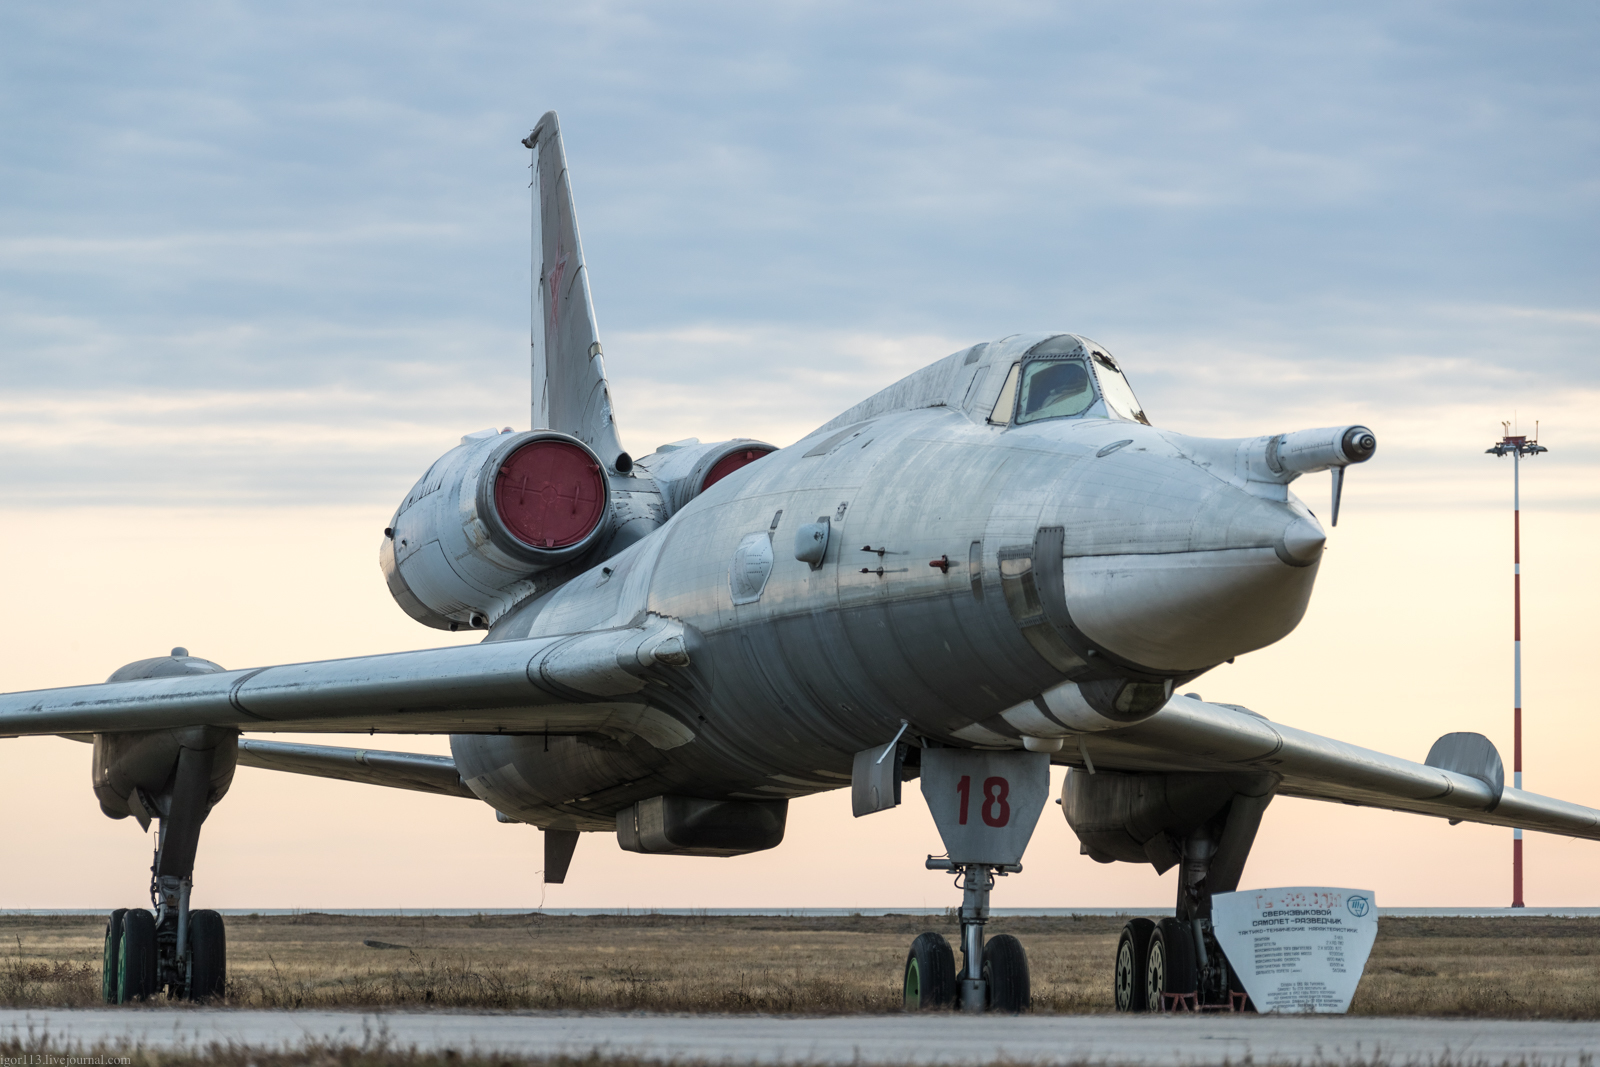 https://cdn-share.slickpic.com/u/IgorKolokolov/Muzej-Dalnej-Aviacii-V-Engelse-C1/org/BA5I0145/p/MTY1NjcwMDU%3D/web.jpg